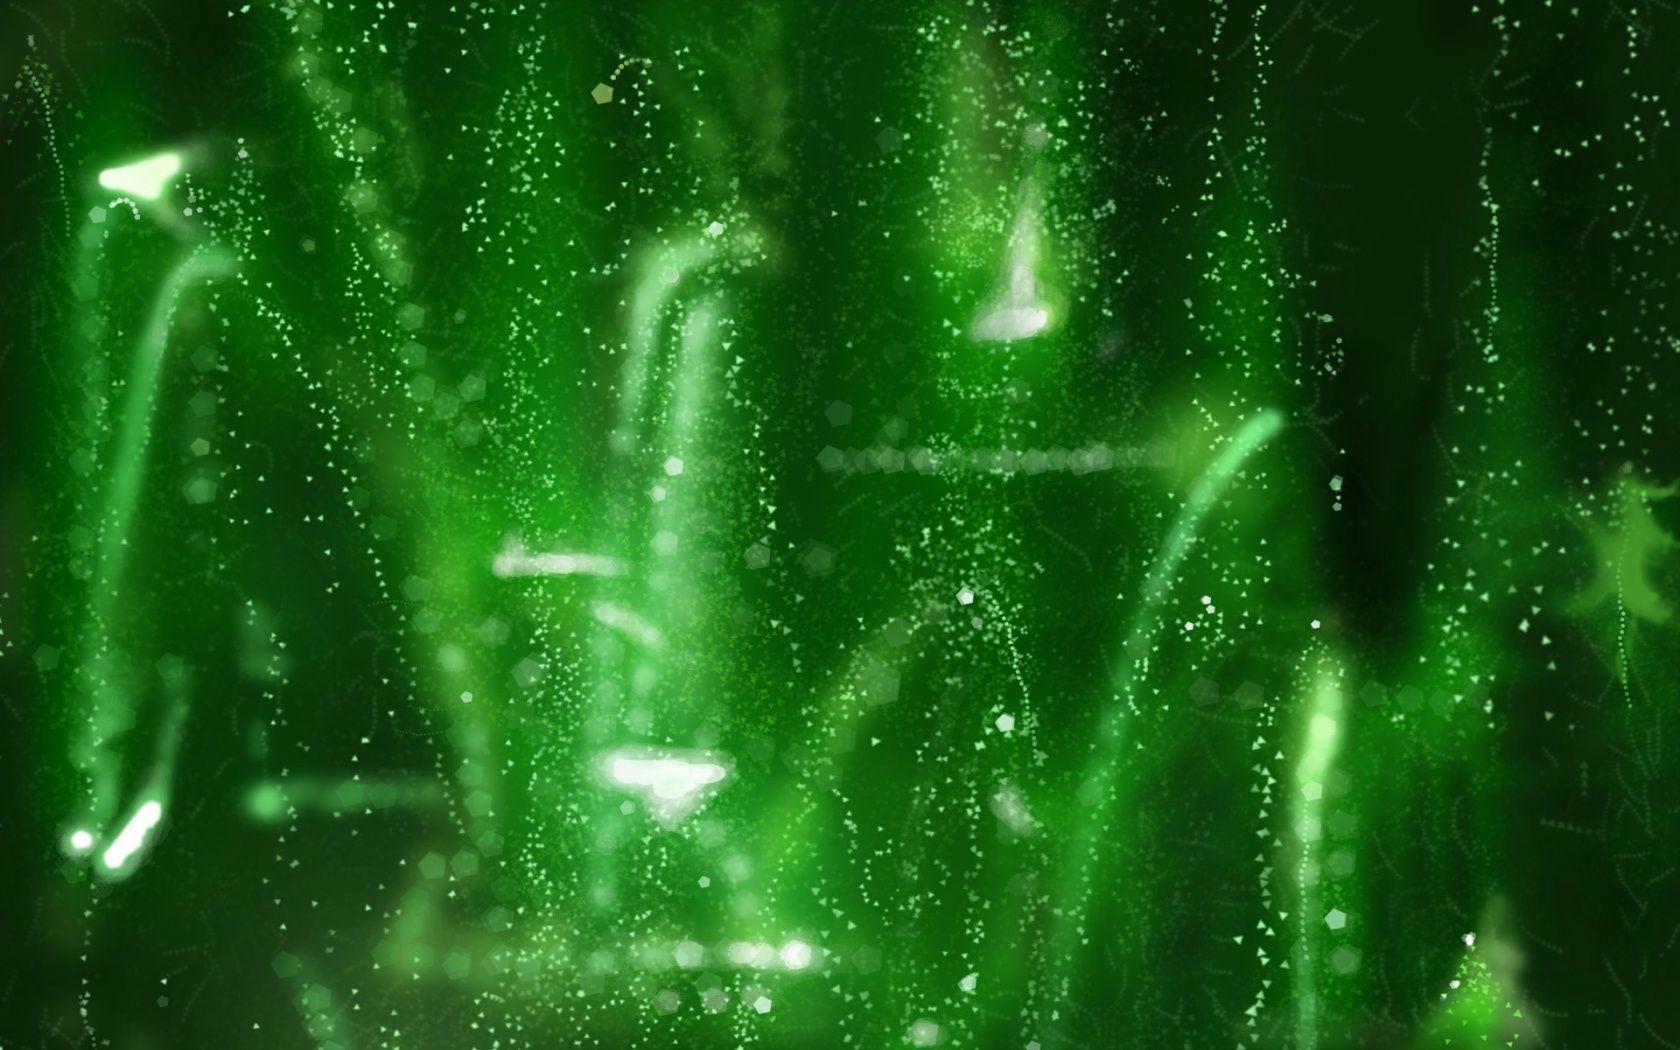 28 Amazing Green Wallpapers in High Quality, Zarita Itzhak